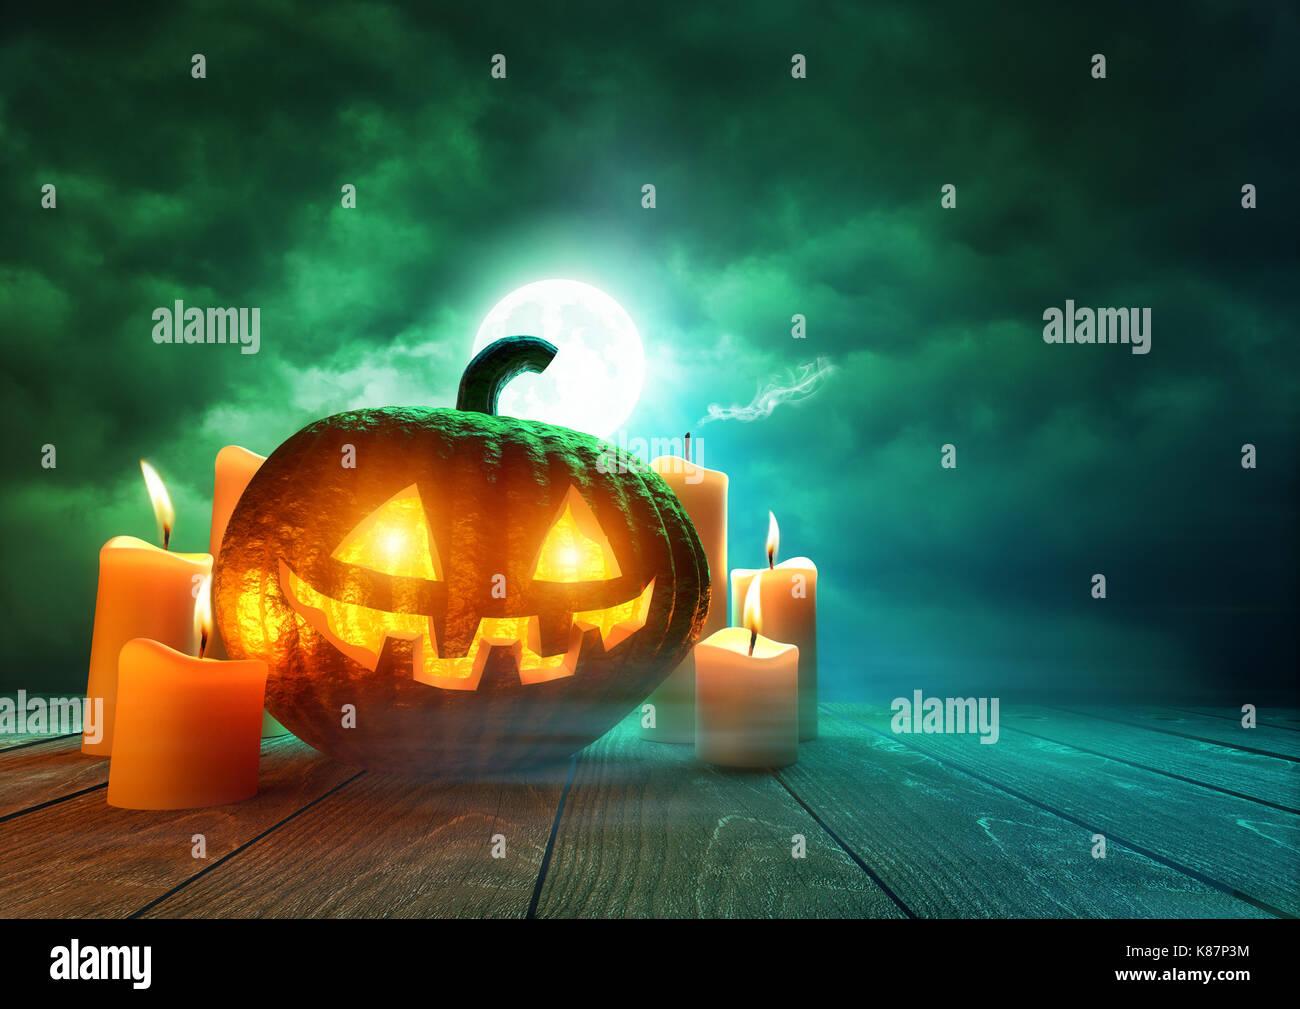 A glowing Pumpkin Jack-O-Lantern lit by an eerie green moonlight on Halloween, mixed media illustration. - Stock Image